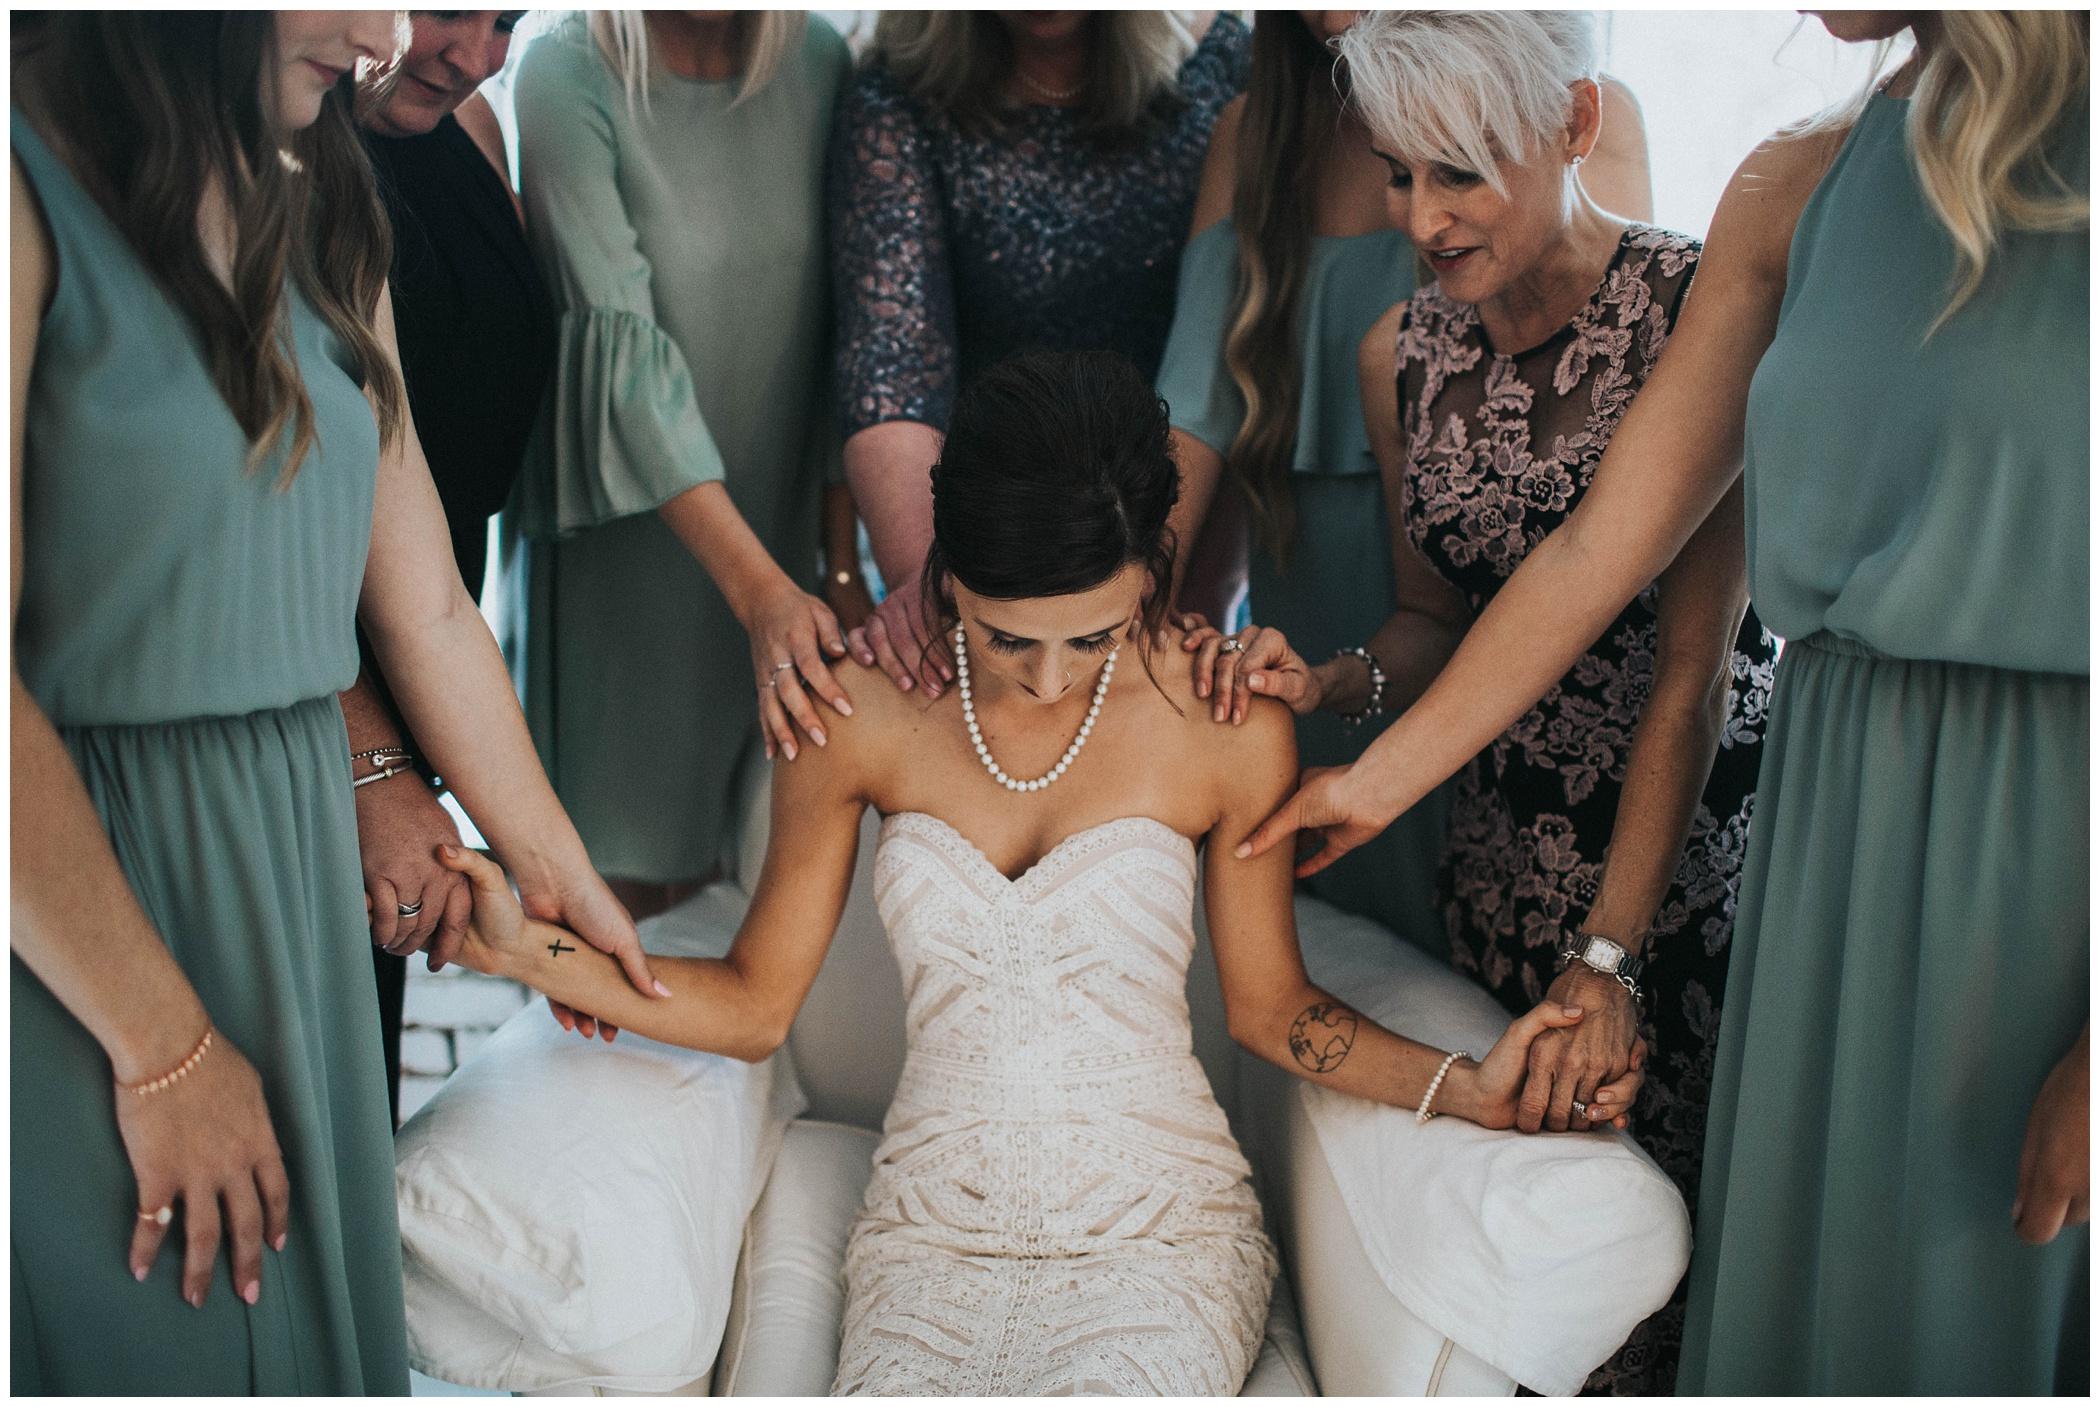 ravington, praying, before, ceremony, the, ravington, centerson, northwest, arkansas, johnsons, photo, wedding, photography